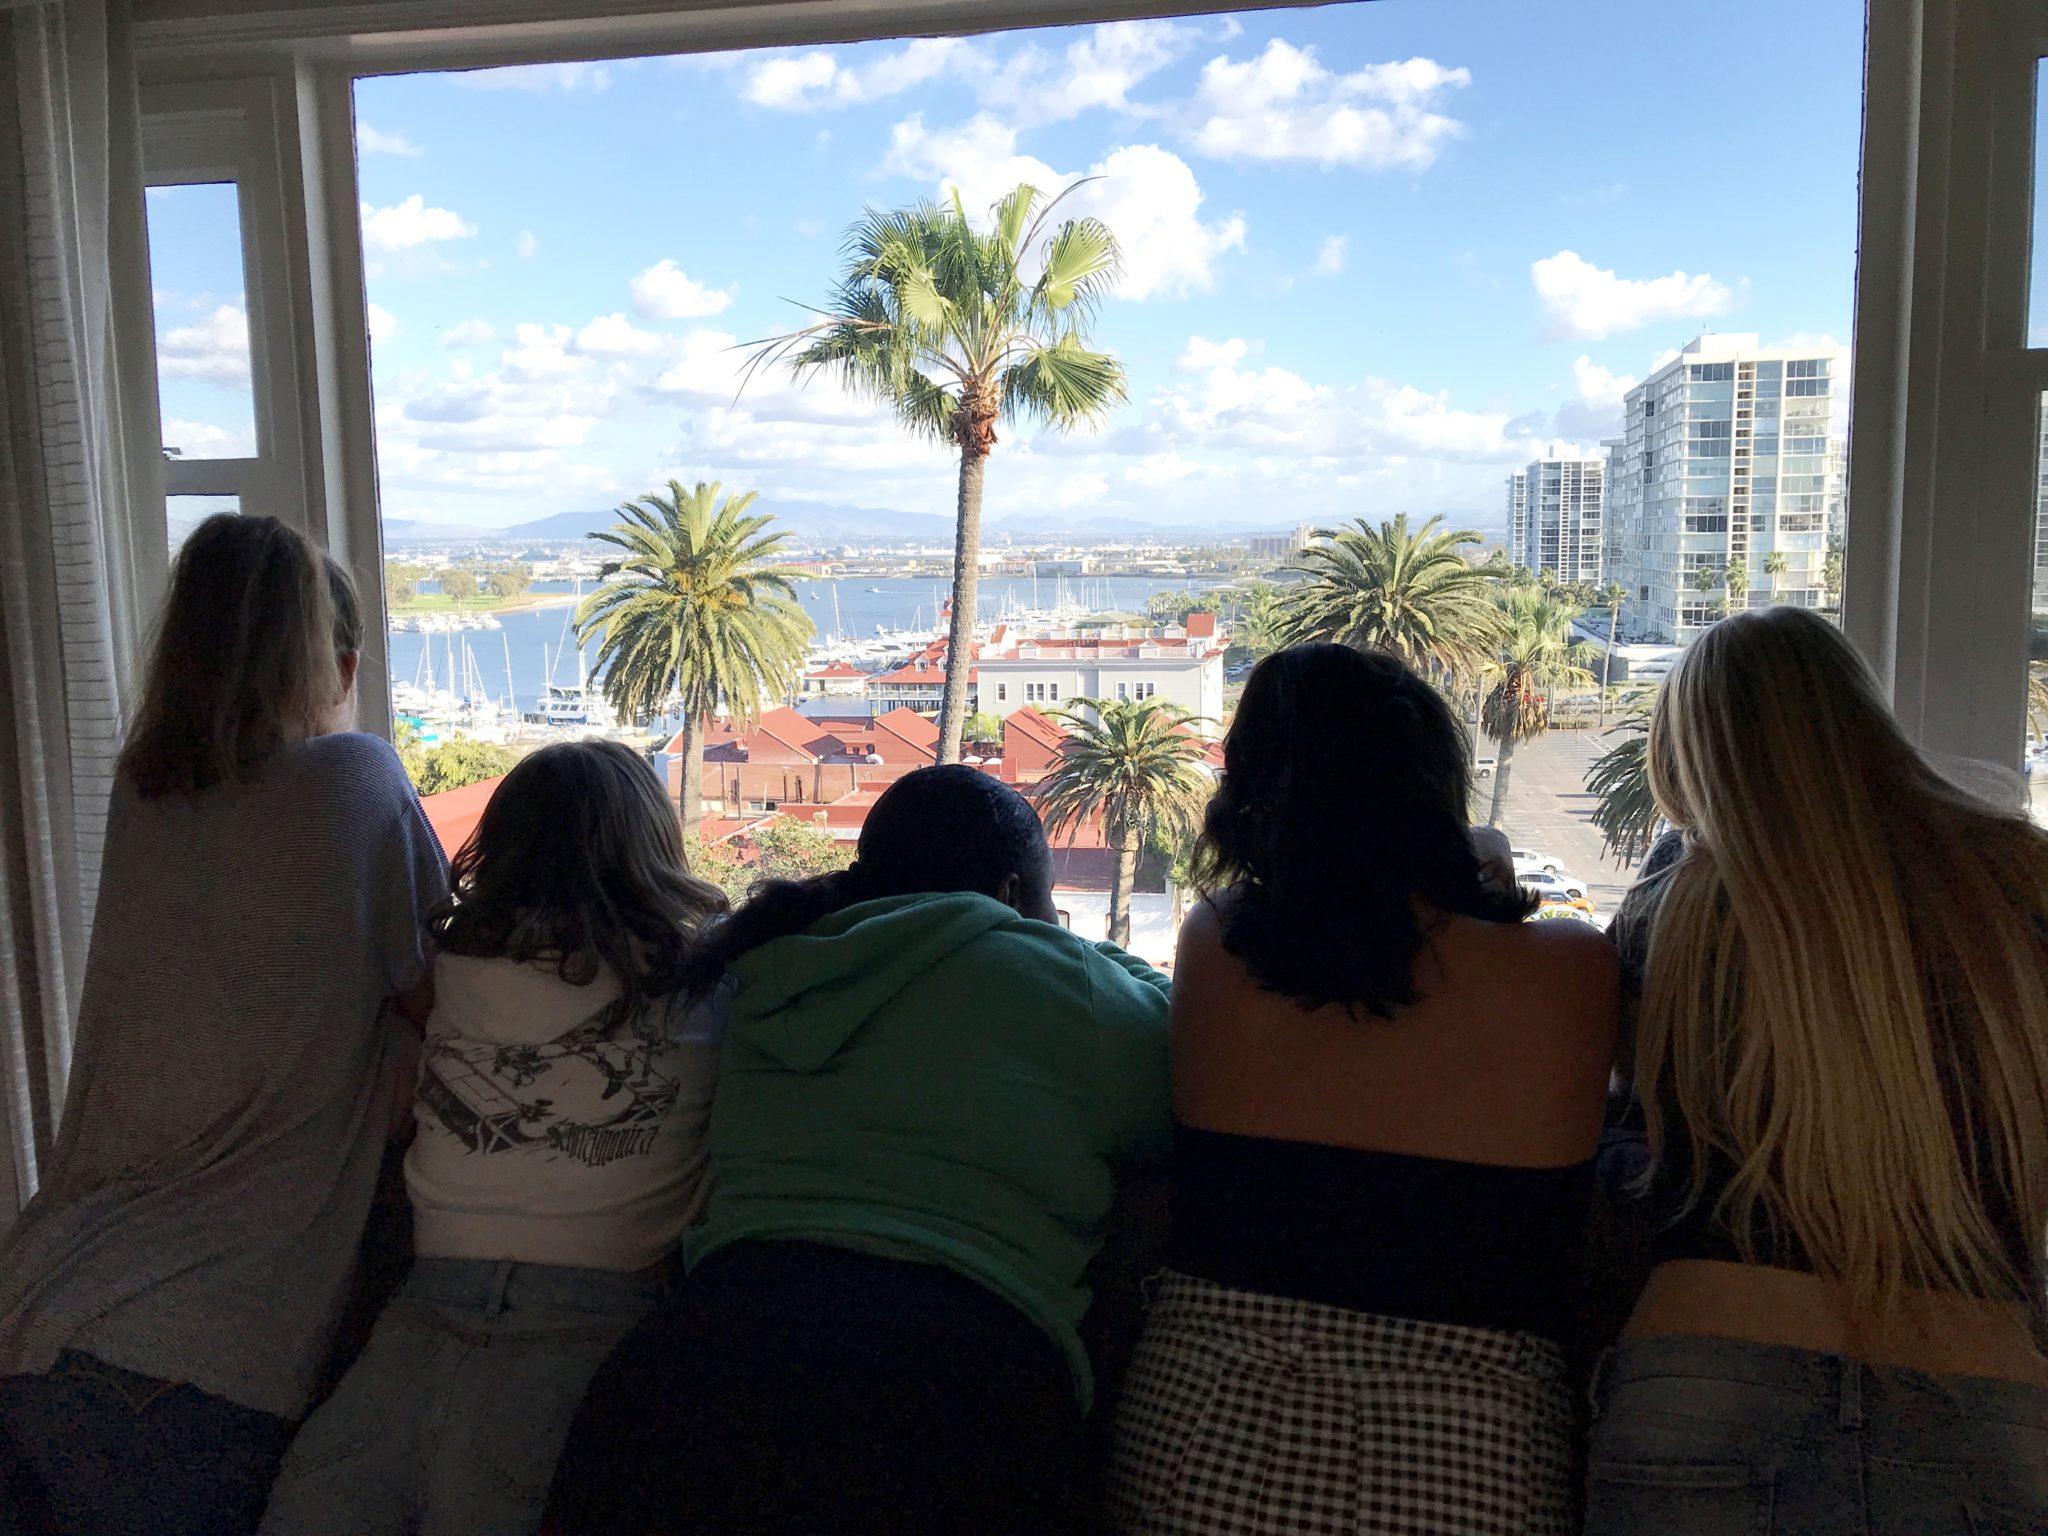 View from Presidential Suite at Hotel Del Coronado